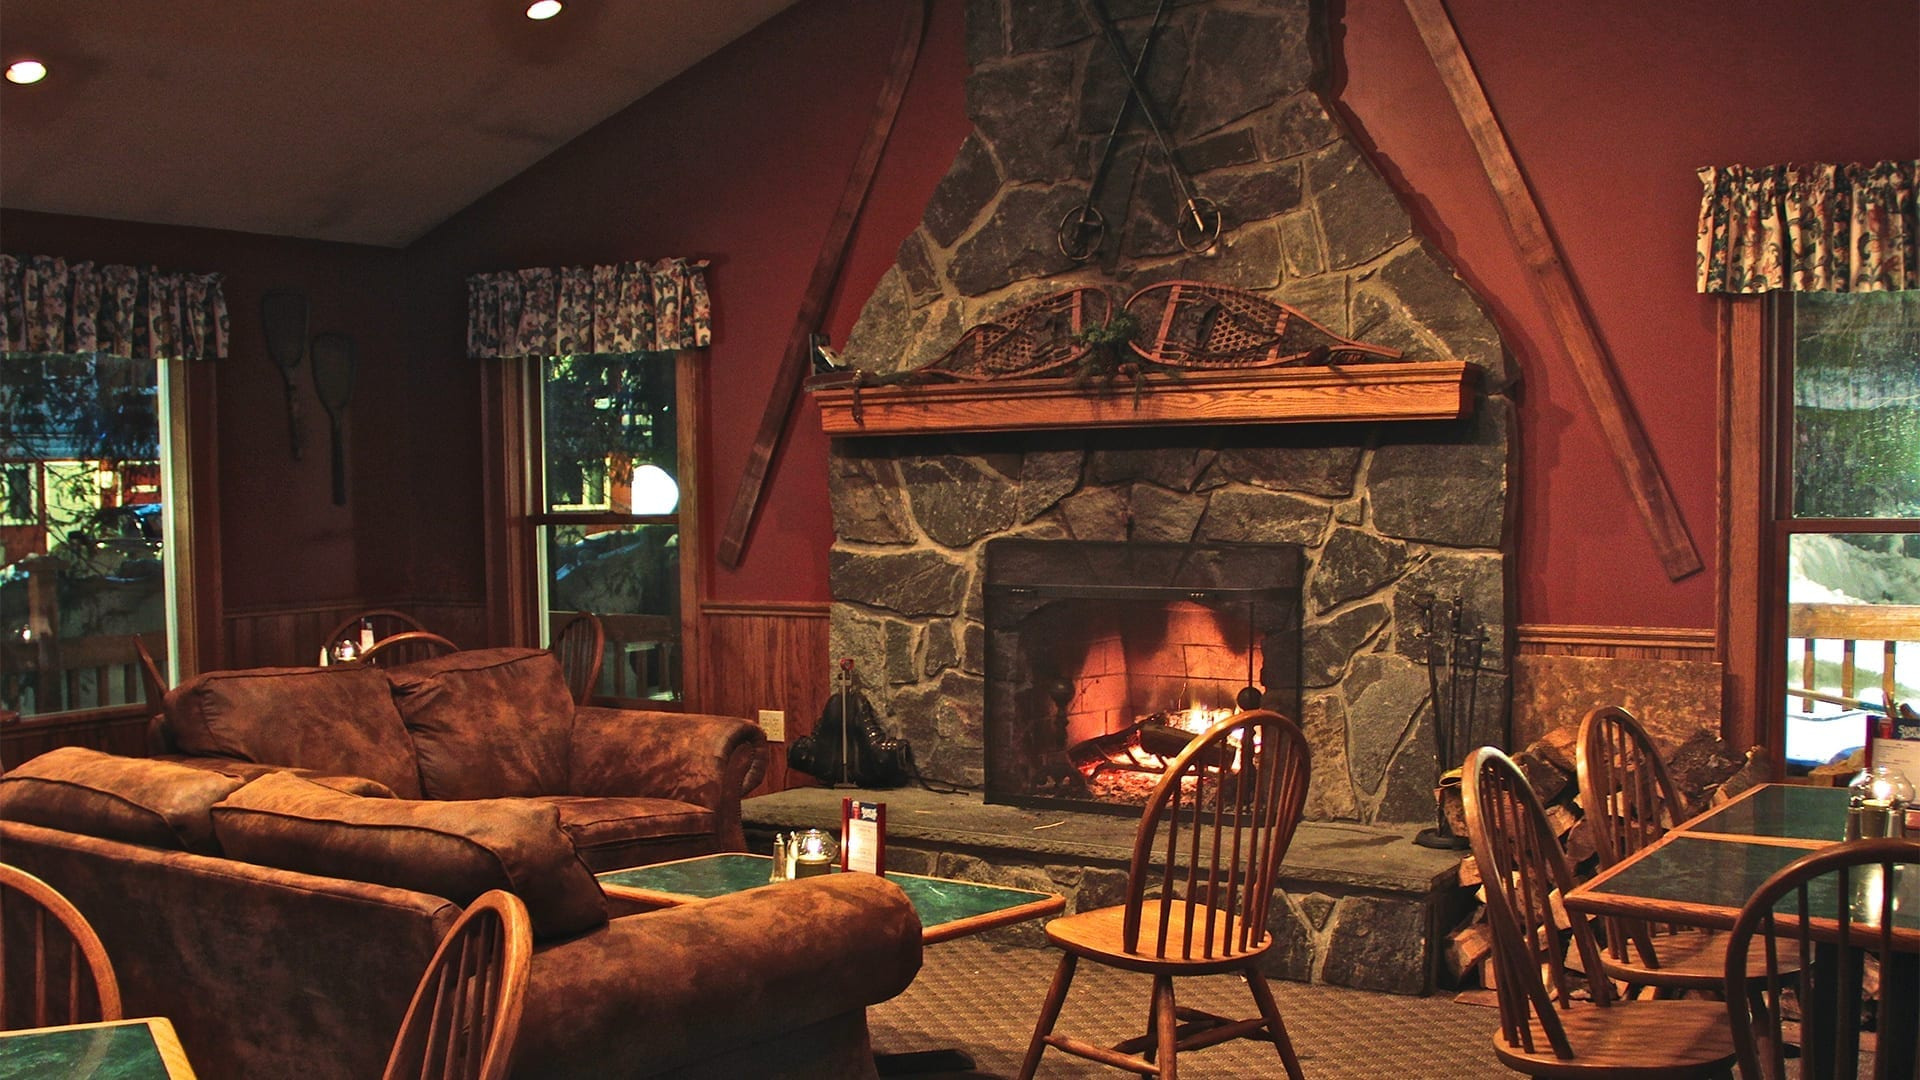 Woodwards Resort & Inn